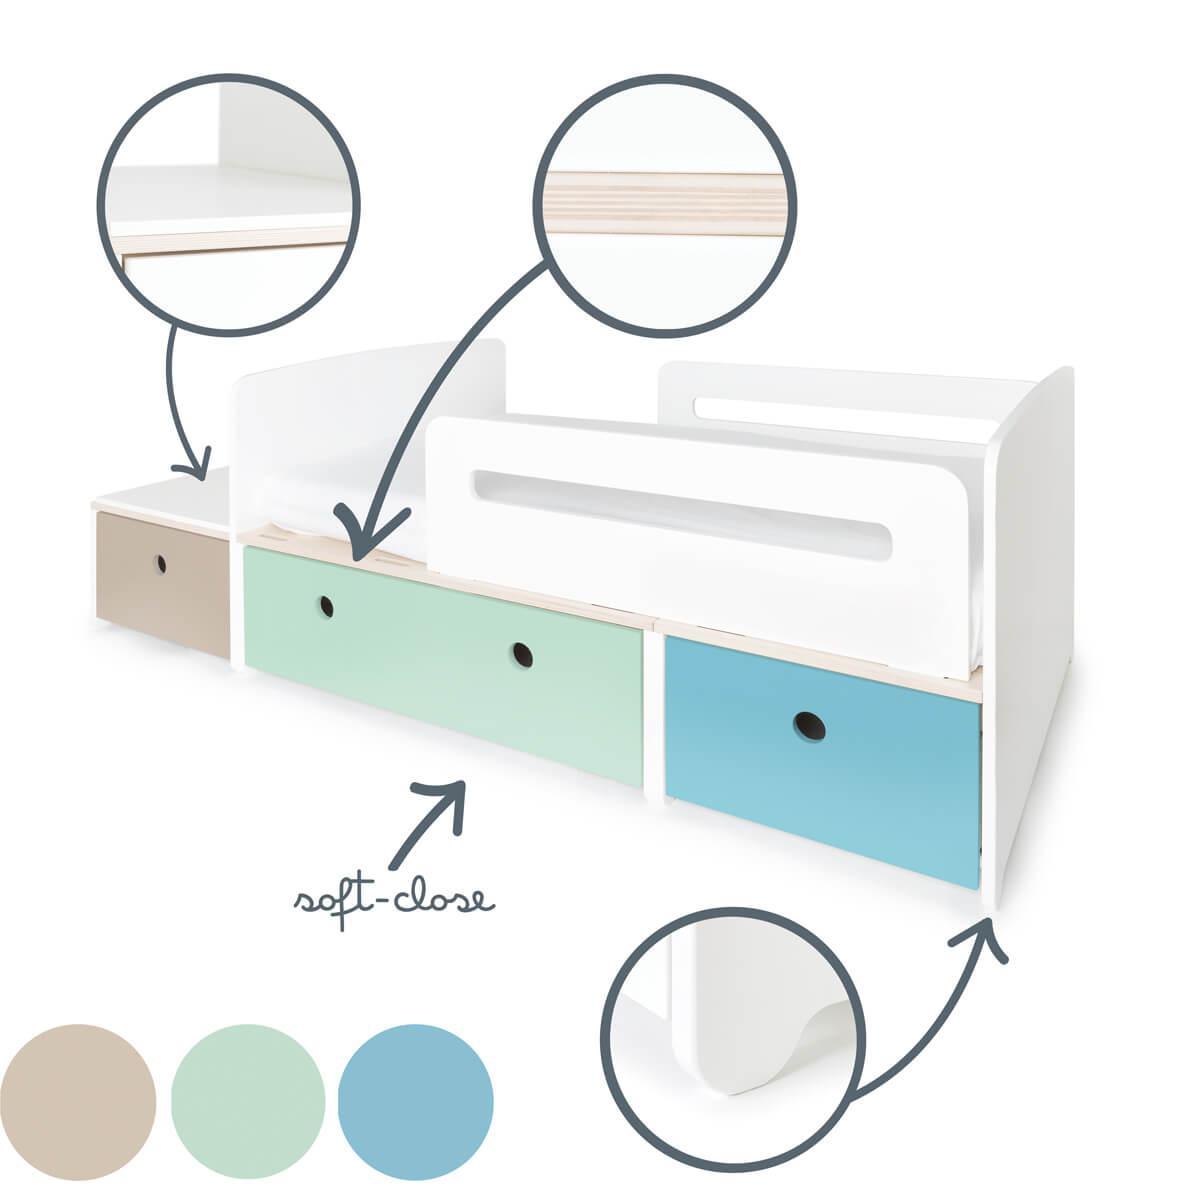 Juniorbett mitwachsend 90x150/200cm COLORFLEX warm grey-mint-paradise blue